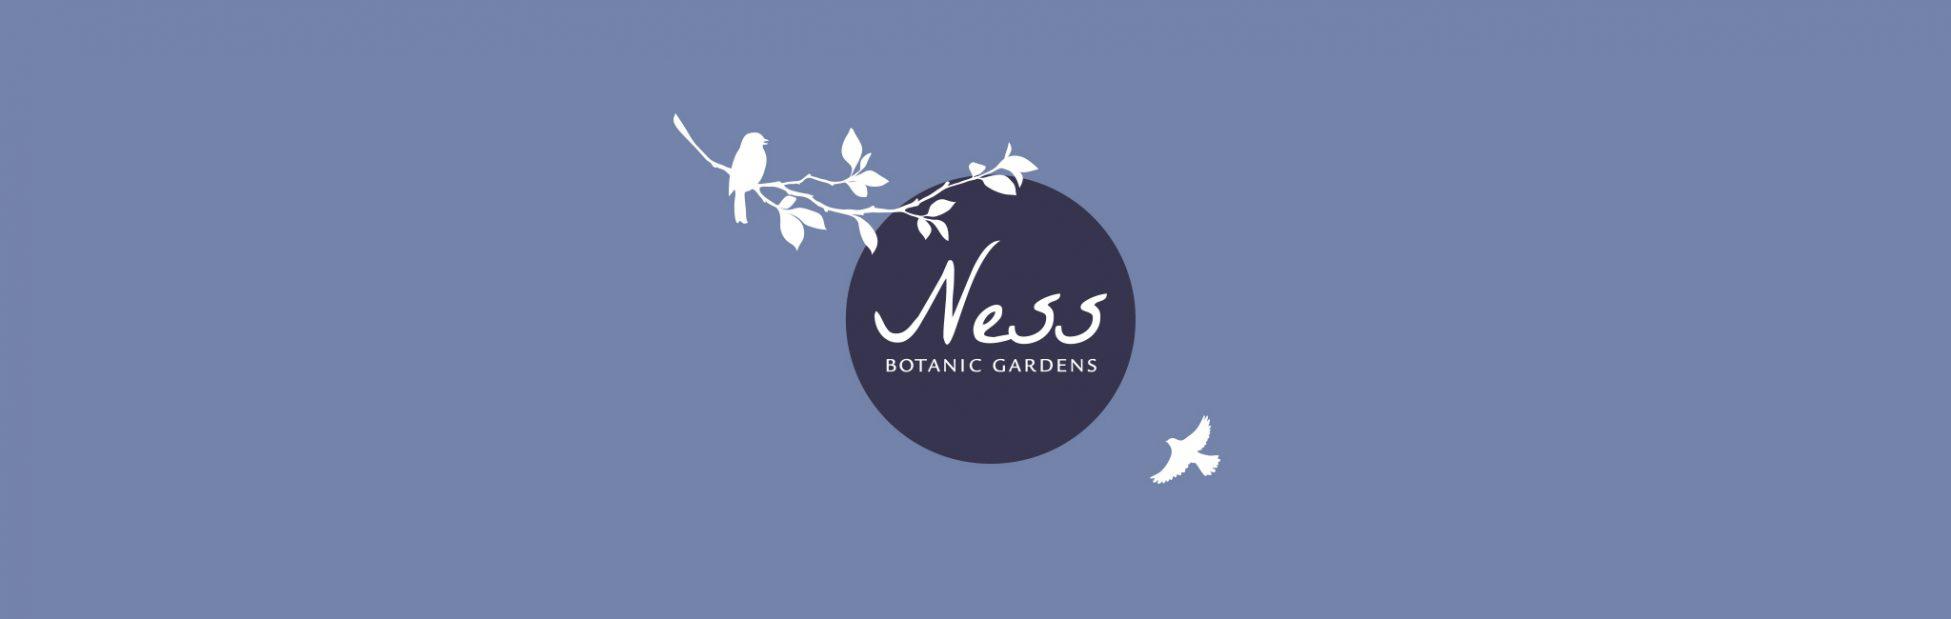 Ness Gardens Header image